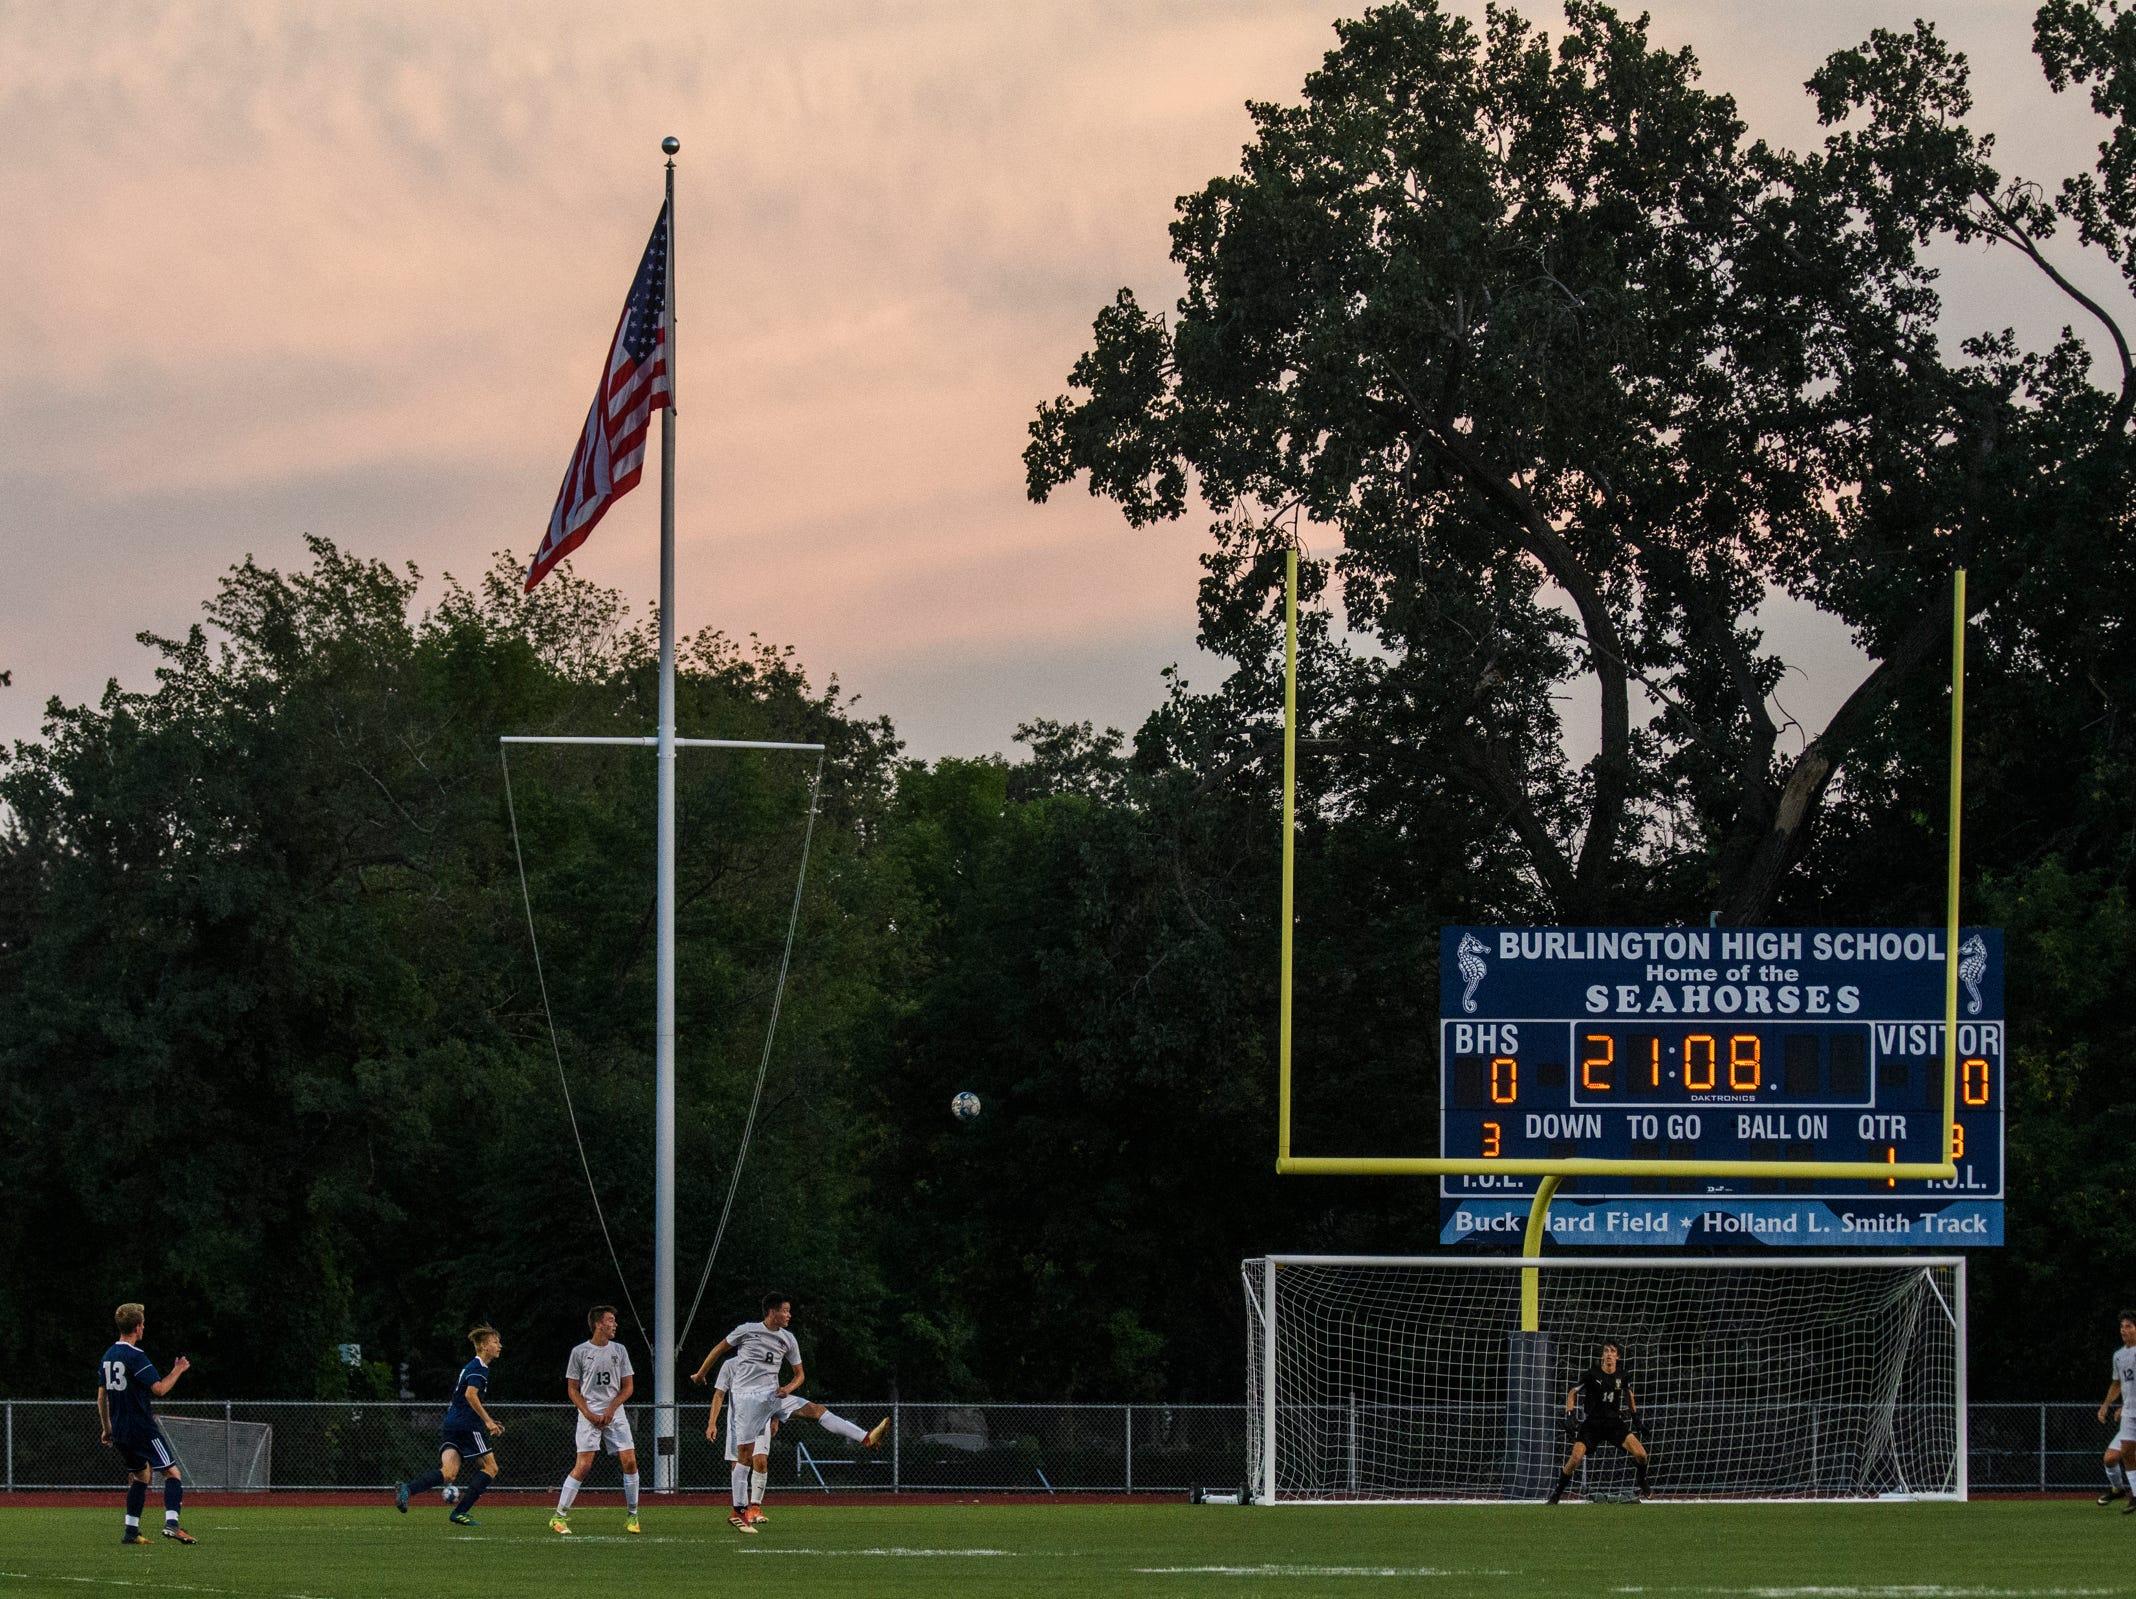 Burlington's Sam Hogg (13) kicks the ball towards the net during the boys soccer game between Stowe and Burlington at Buck Hard field on Wednesday night September 5, 2018 in Burlington.